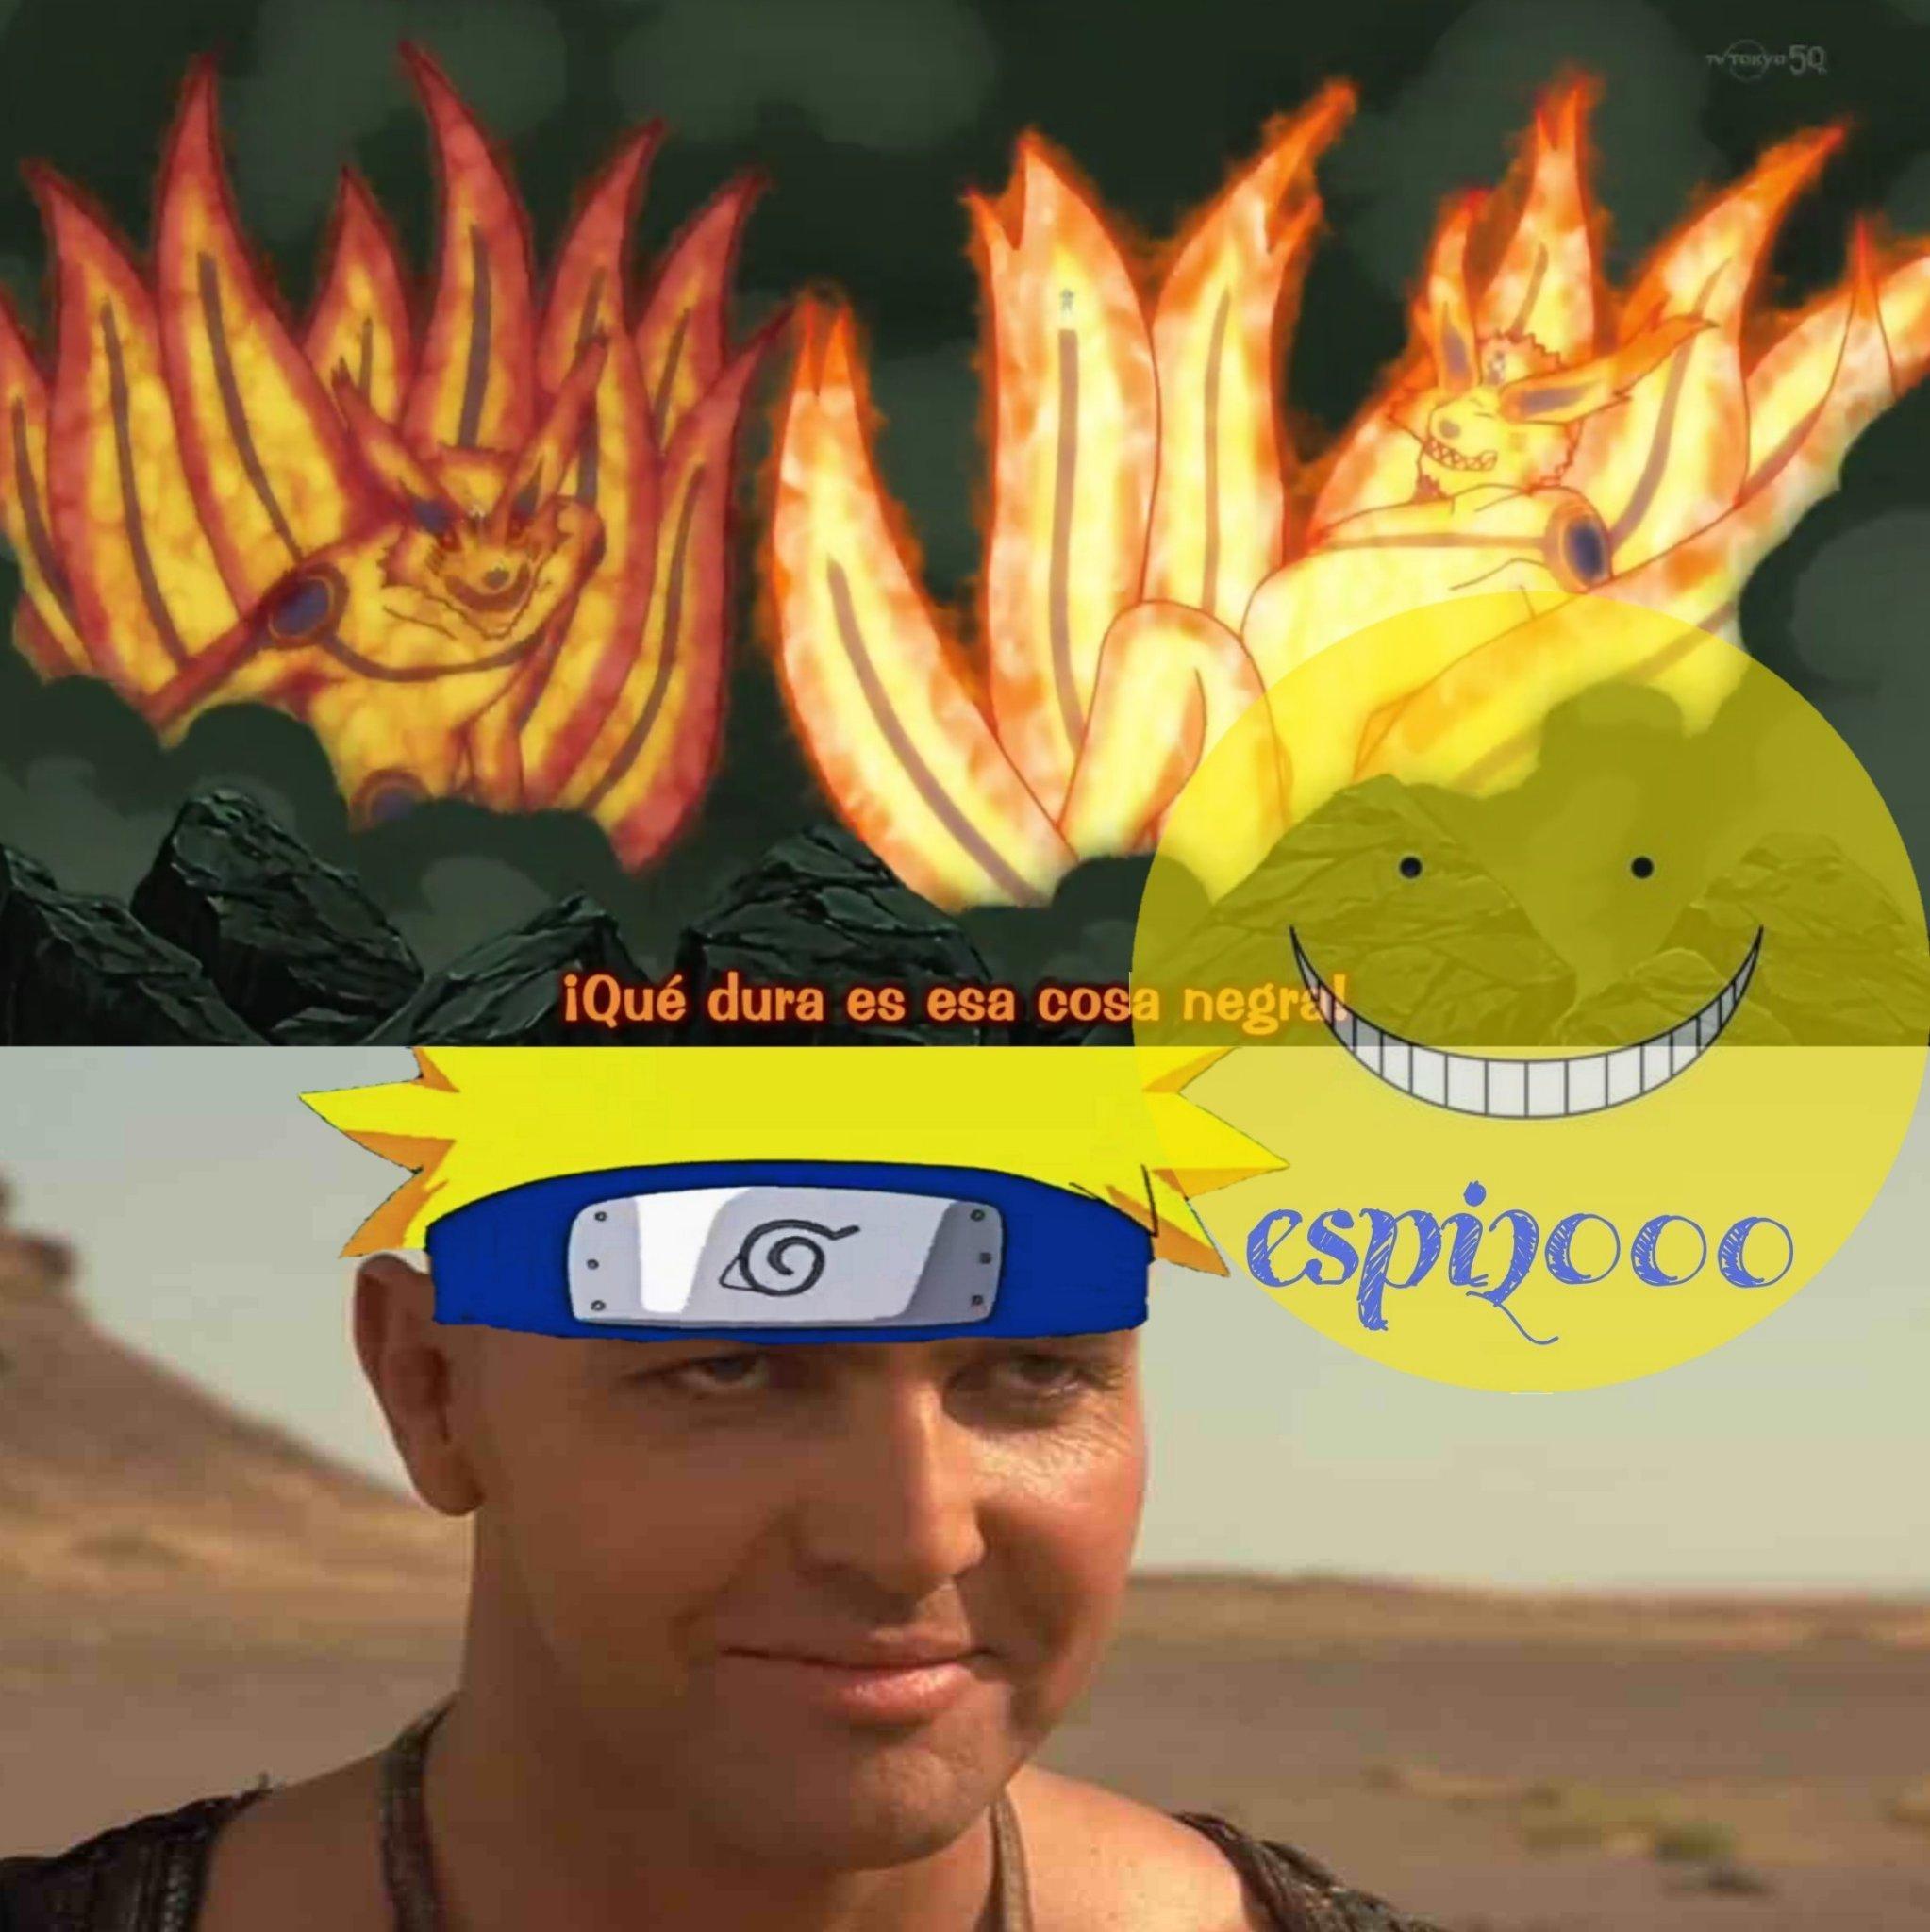 Este Naruto xD - meme